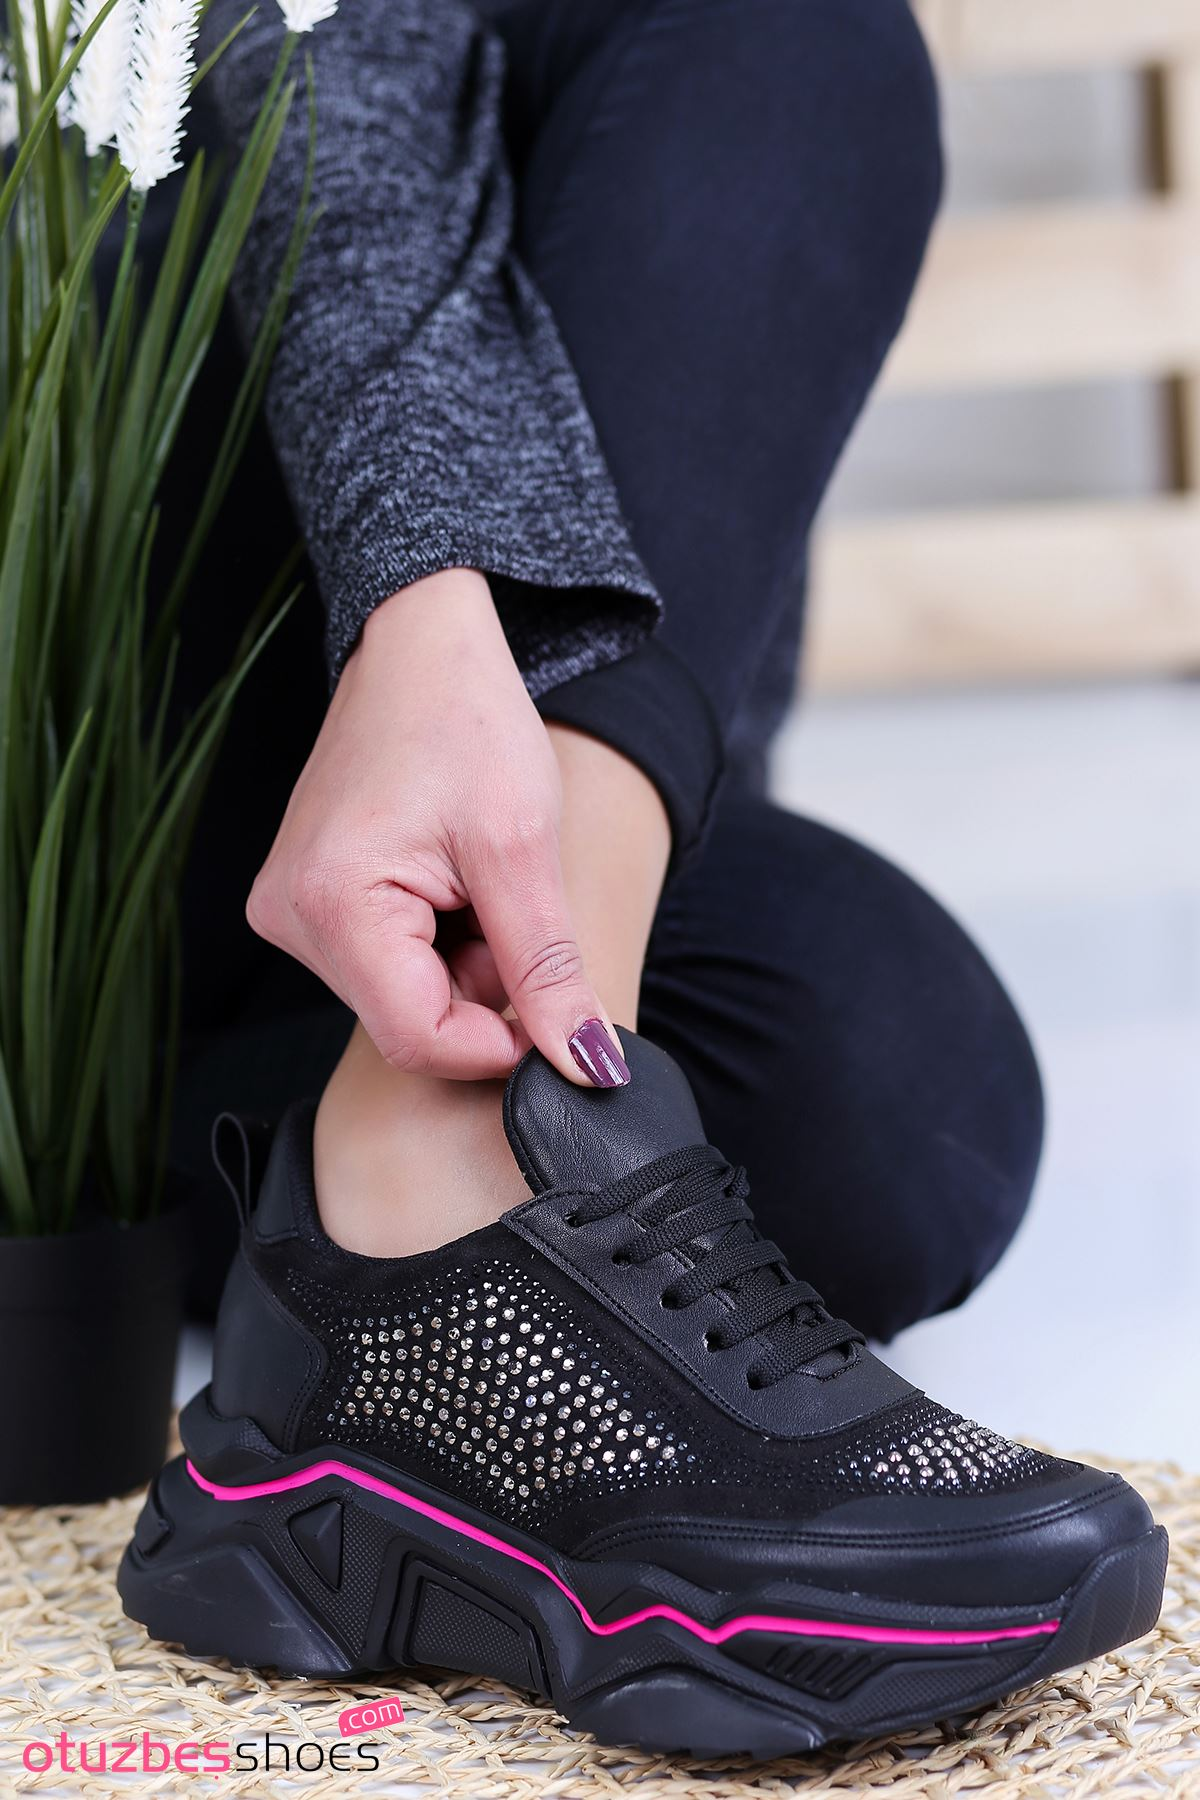 Ahu Süet Pembe Şeritli Taş Detay Spor Ayakkabı Siyah